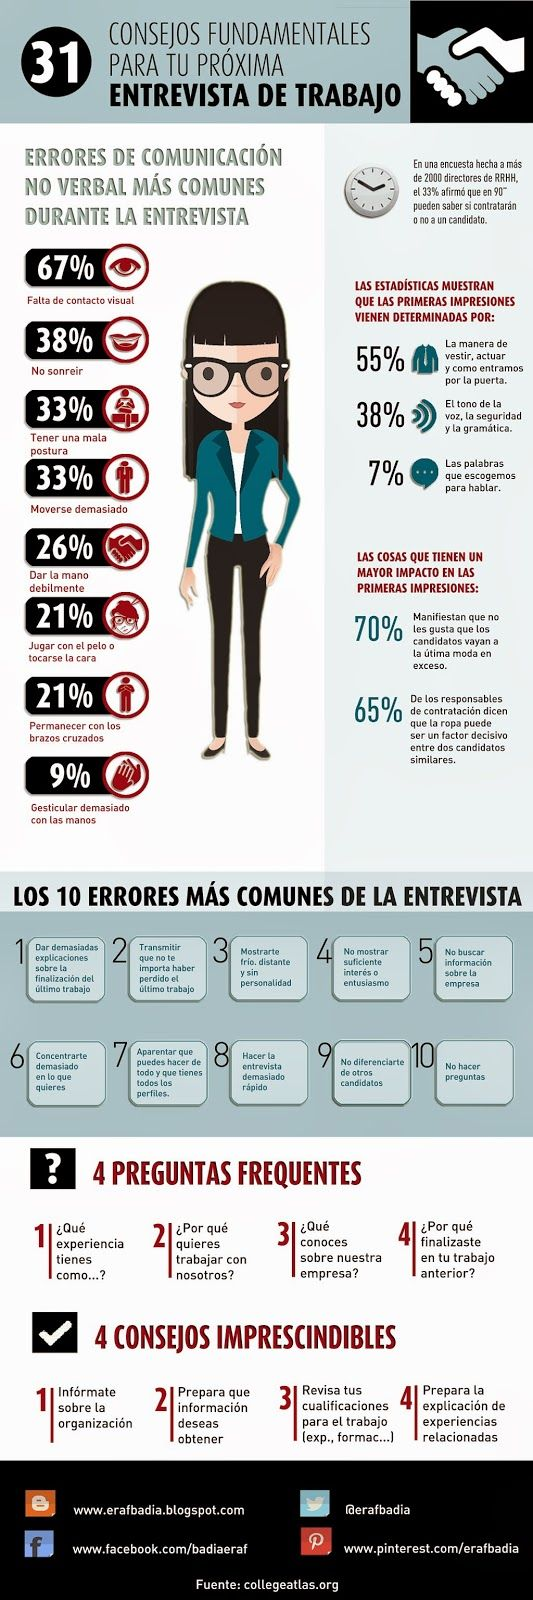 31 consejos para tu próxima entrevista de trabajo. Infografía. ~ ESPAI DE RECERCA ACTIVA DE FEINA